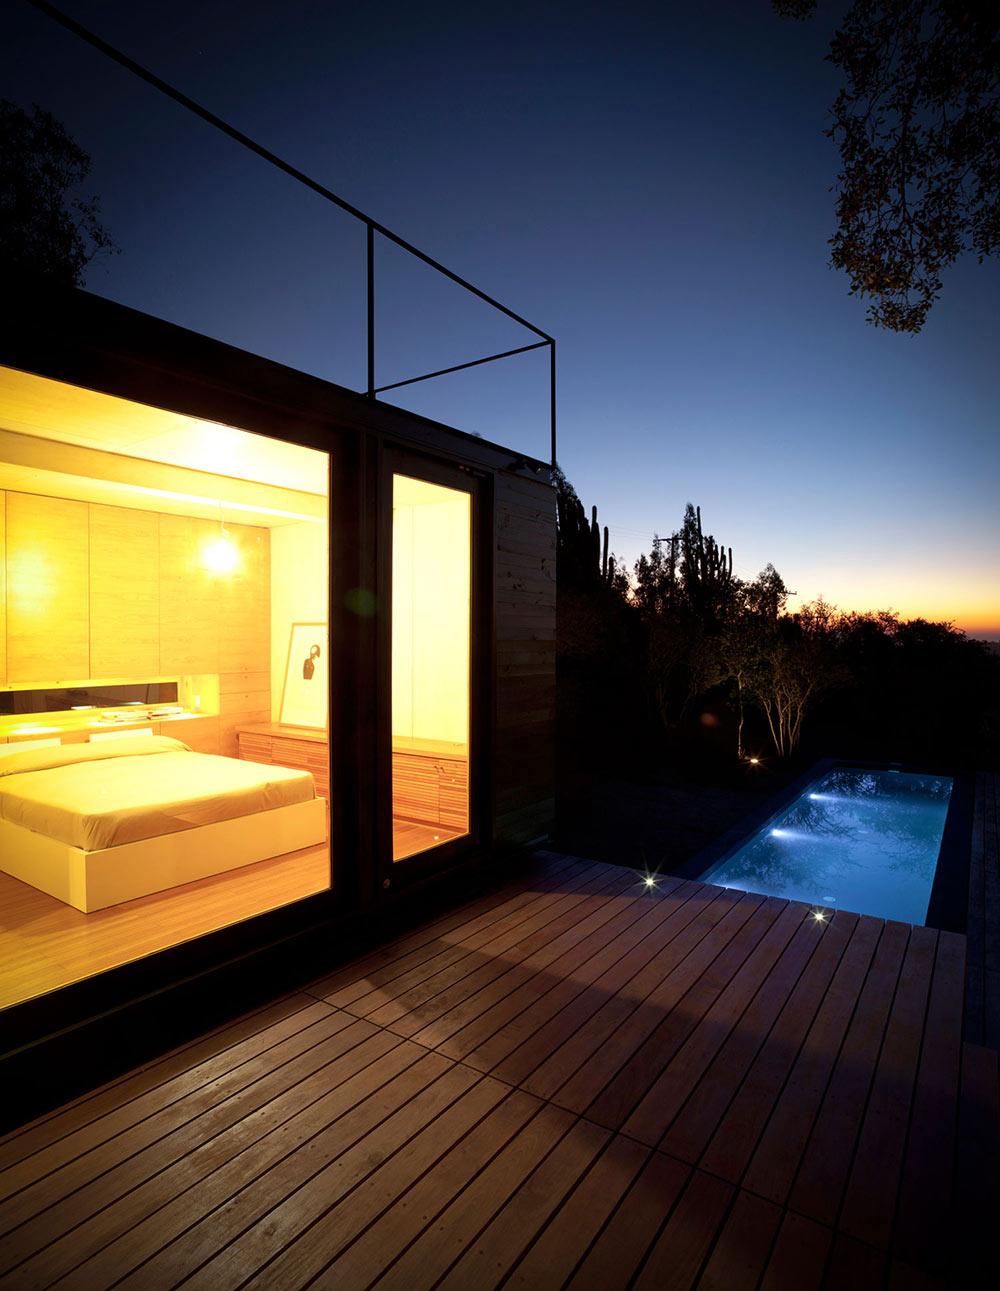 Bedroom, Deck, Pool Lighting, Pangal Cabin in Casablanca, Chile